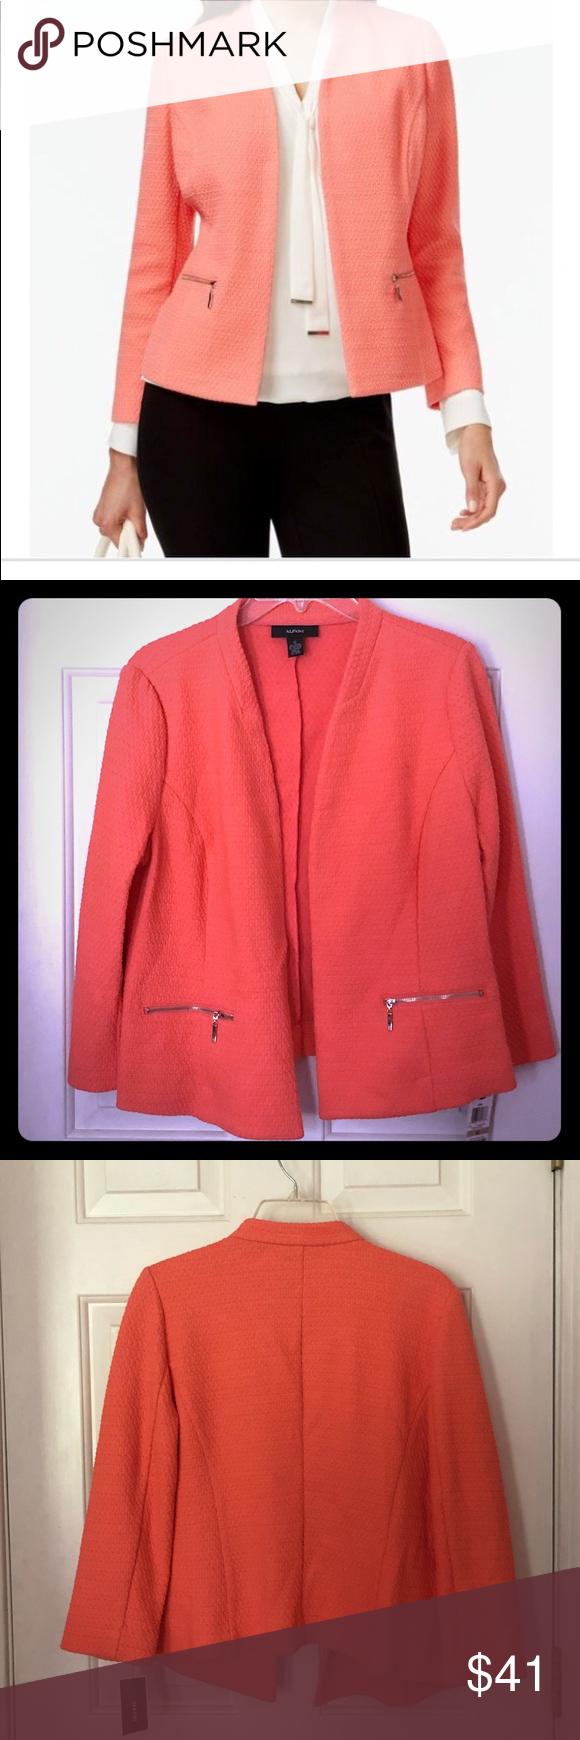 7766c95b4e30 ALFANI Georgia Peach - Textured Blazer Size 12 NEW ALFANI Georgia Peach  Blazer Size 12 NEW